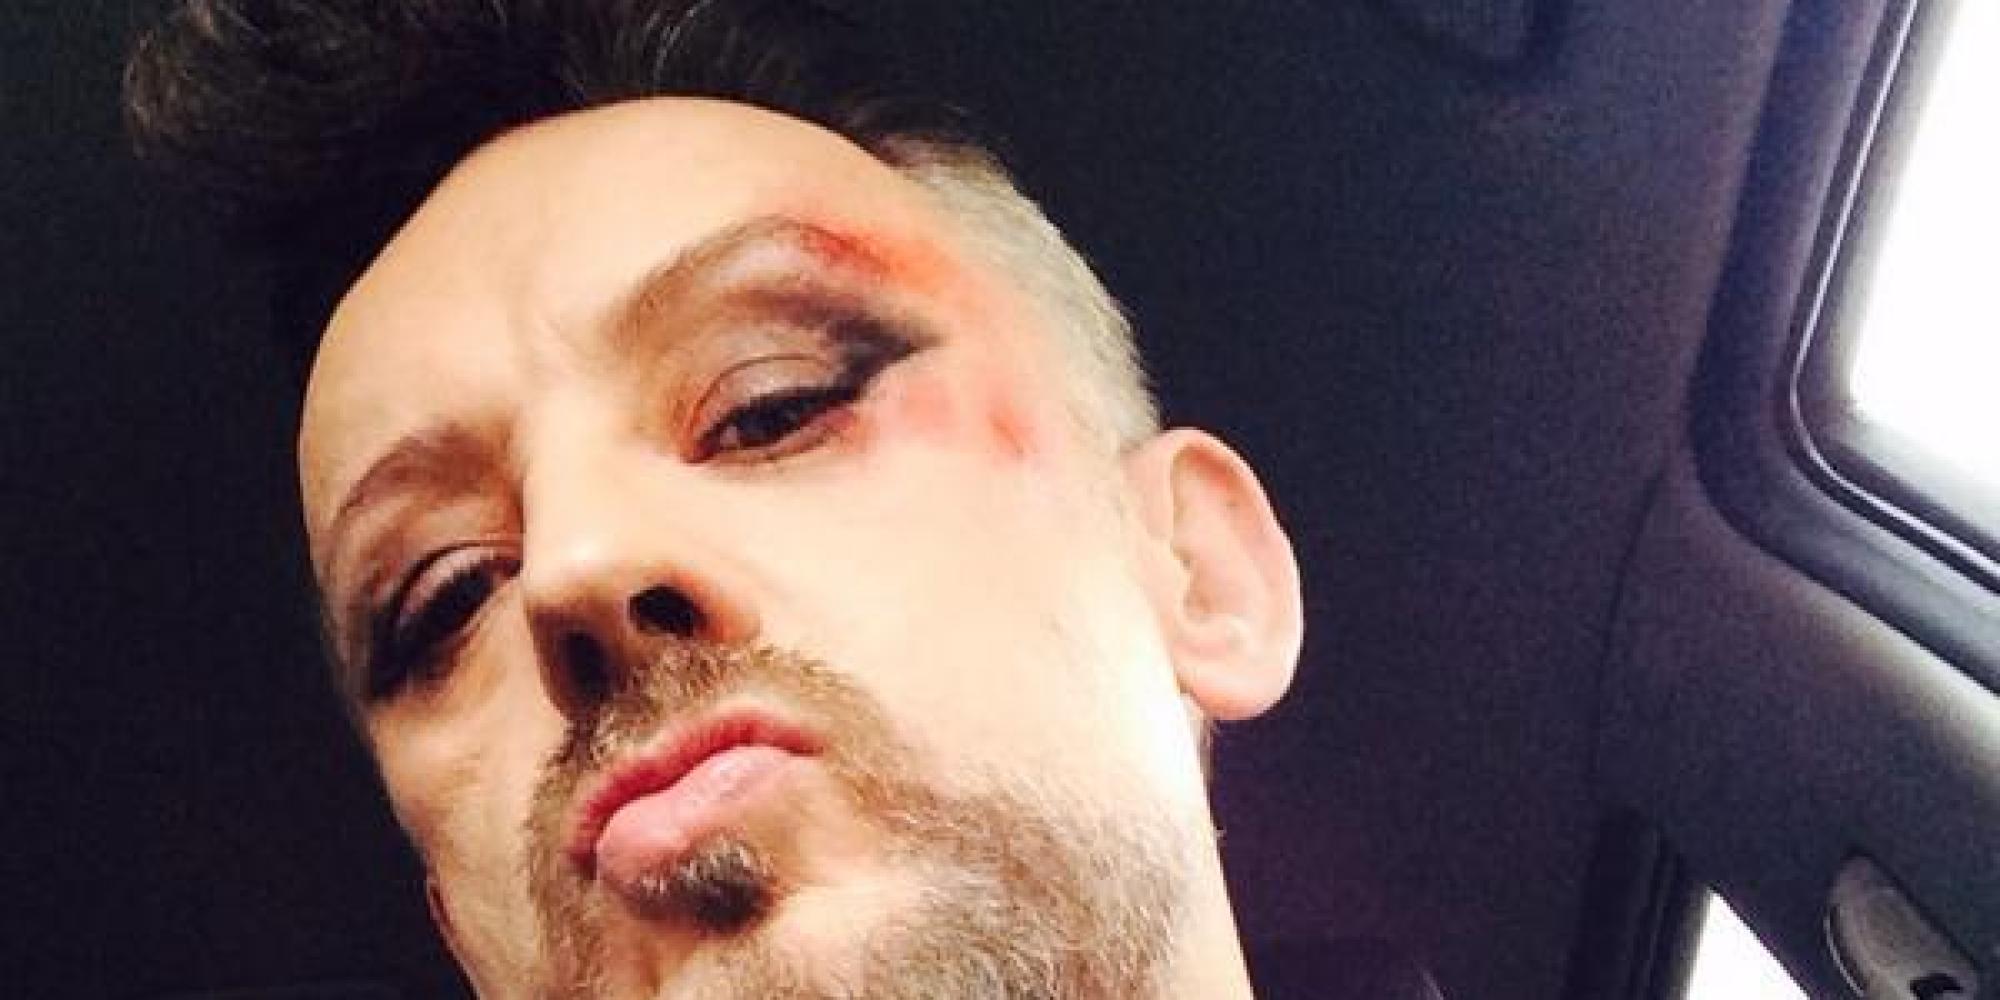 boy george walks  red carpet  bruiselike makeup  hes  fashion victim